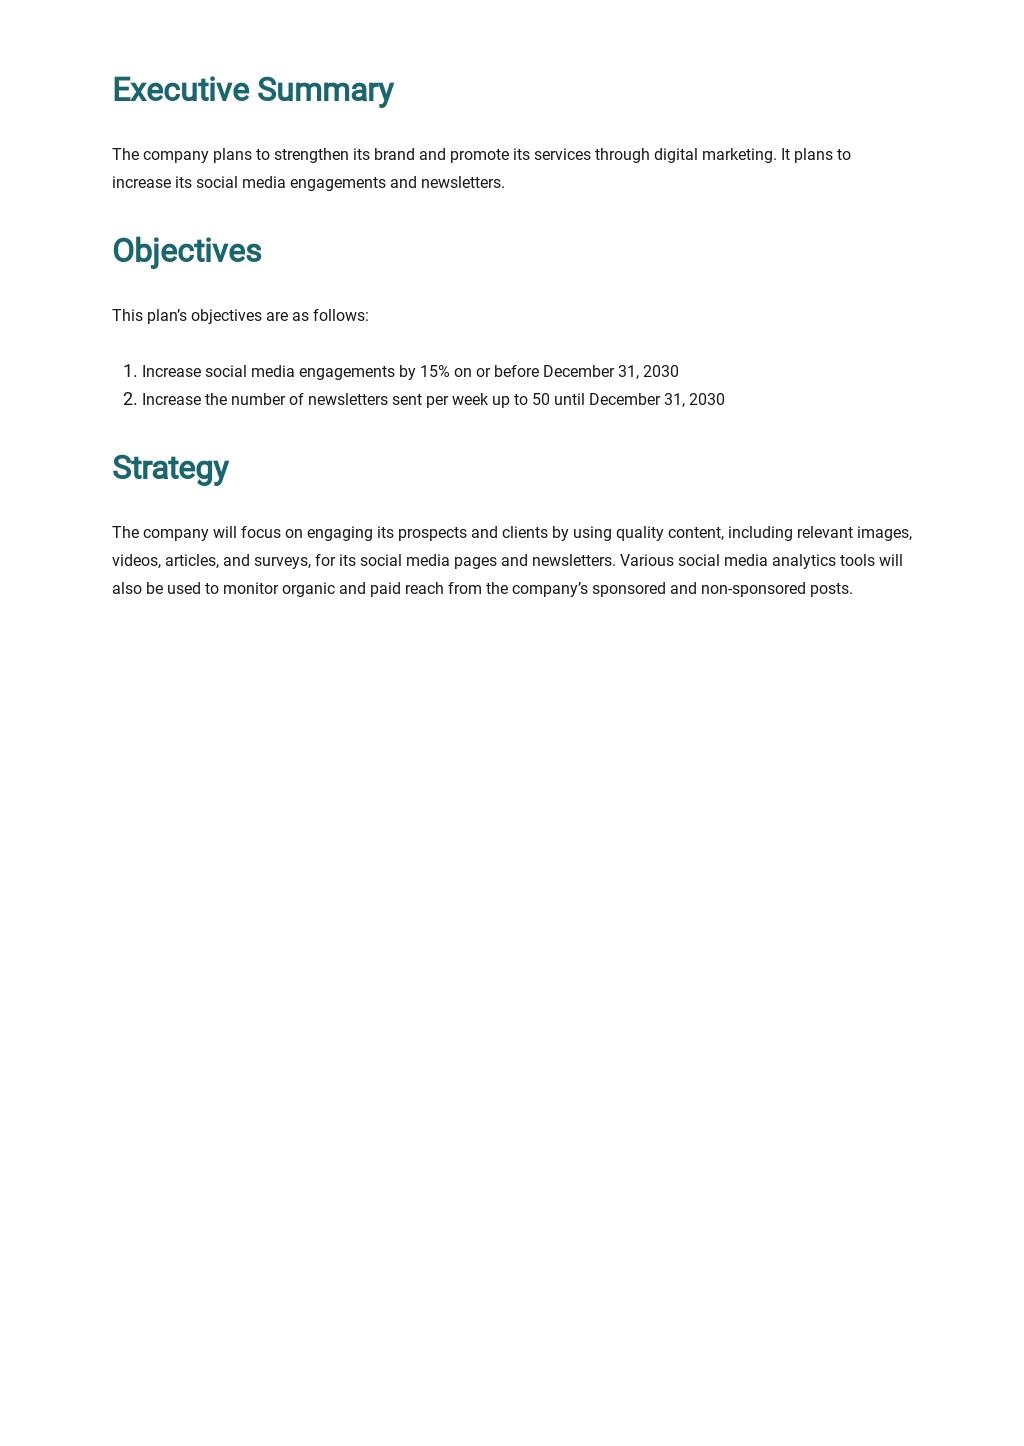 Real Estate / Property Strategic Plan Template 1.jpe